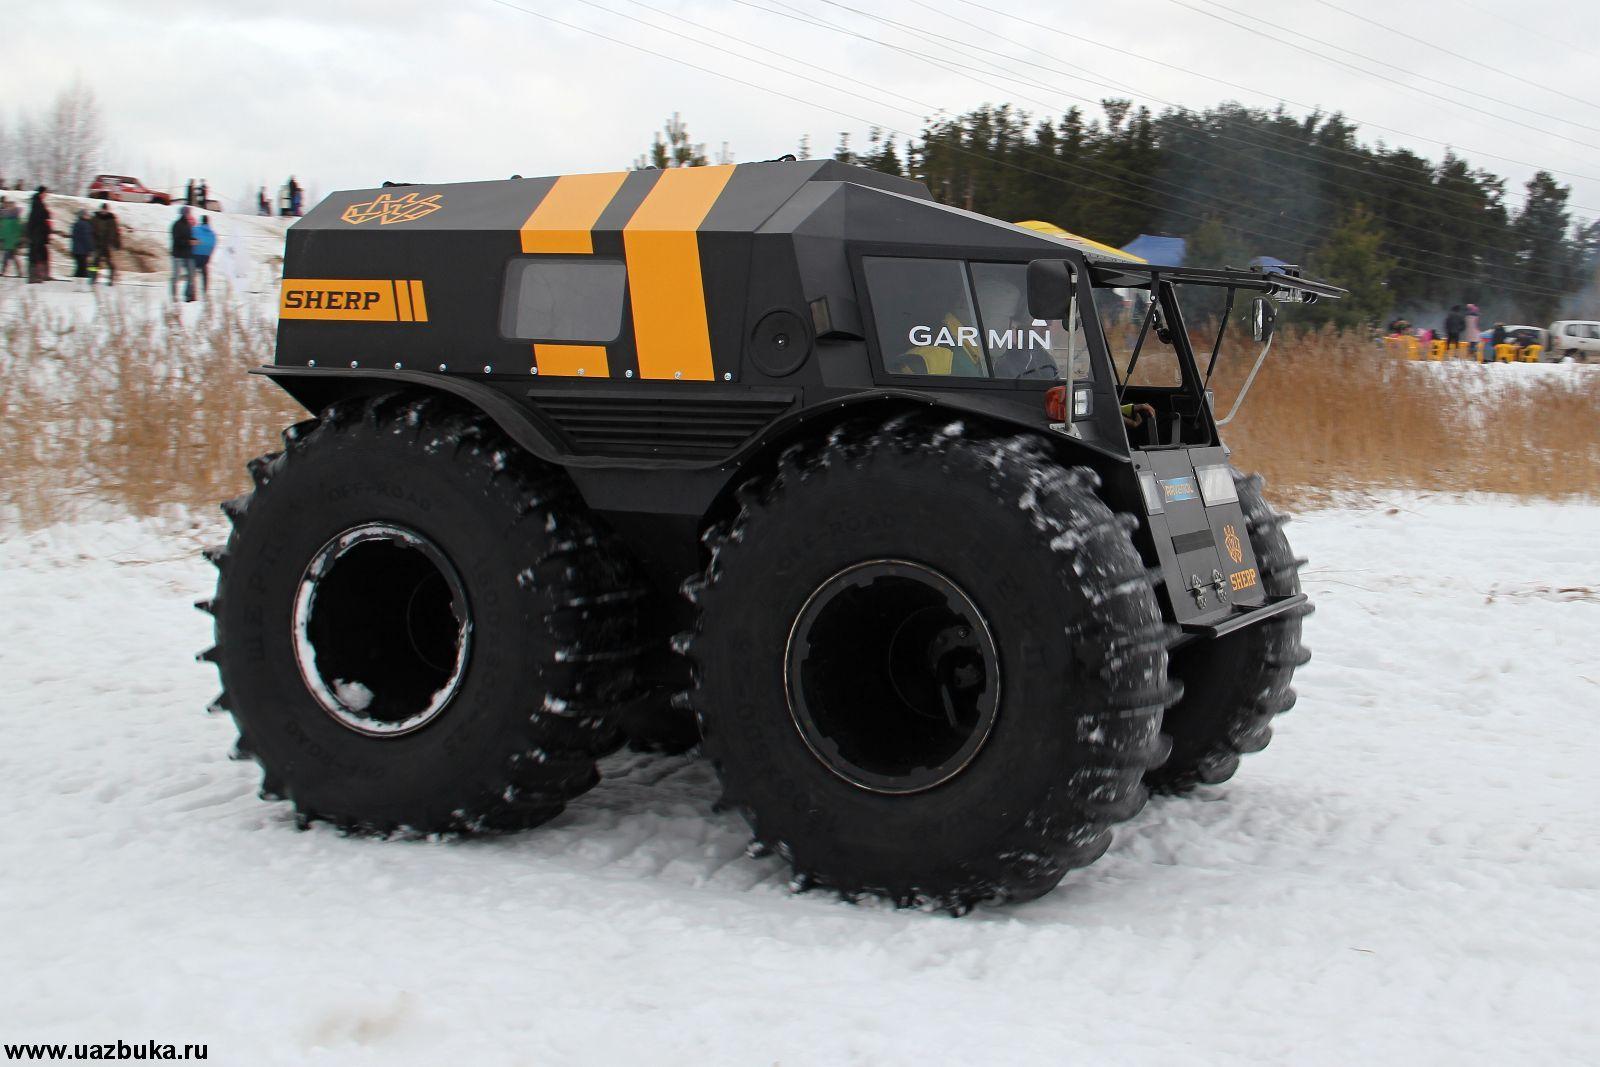 The Russian Land Sea Mud Snow Sherp Atv Mud Trucks Snow Vehicles All Terrain Vehicles